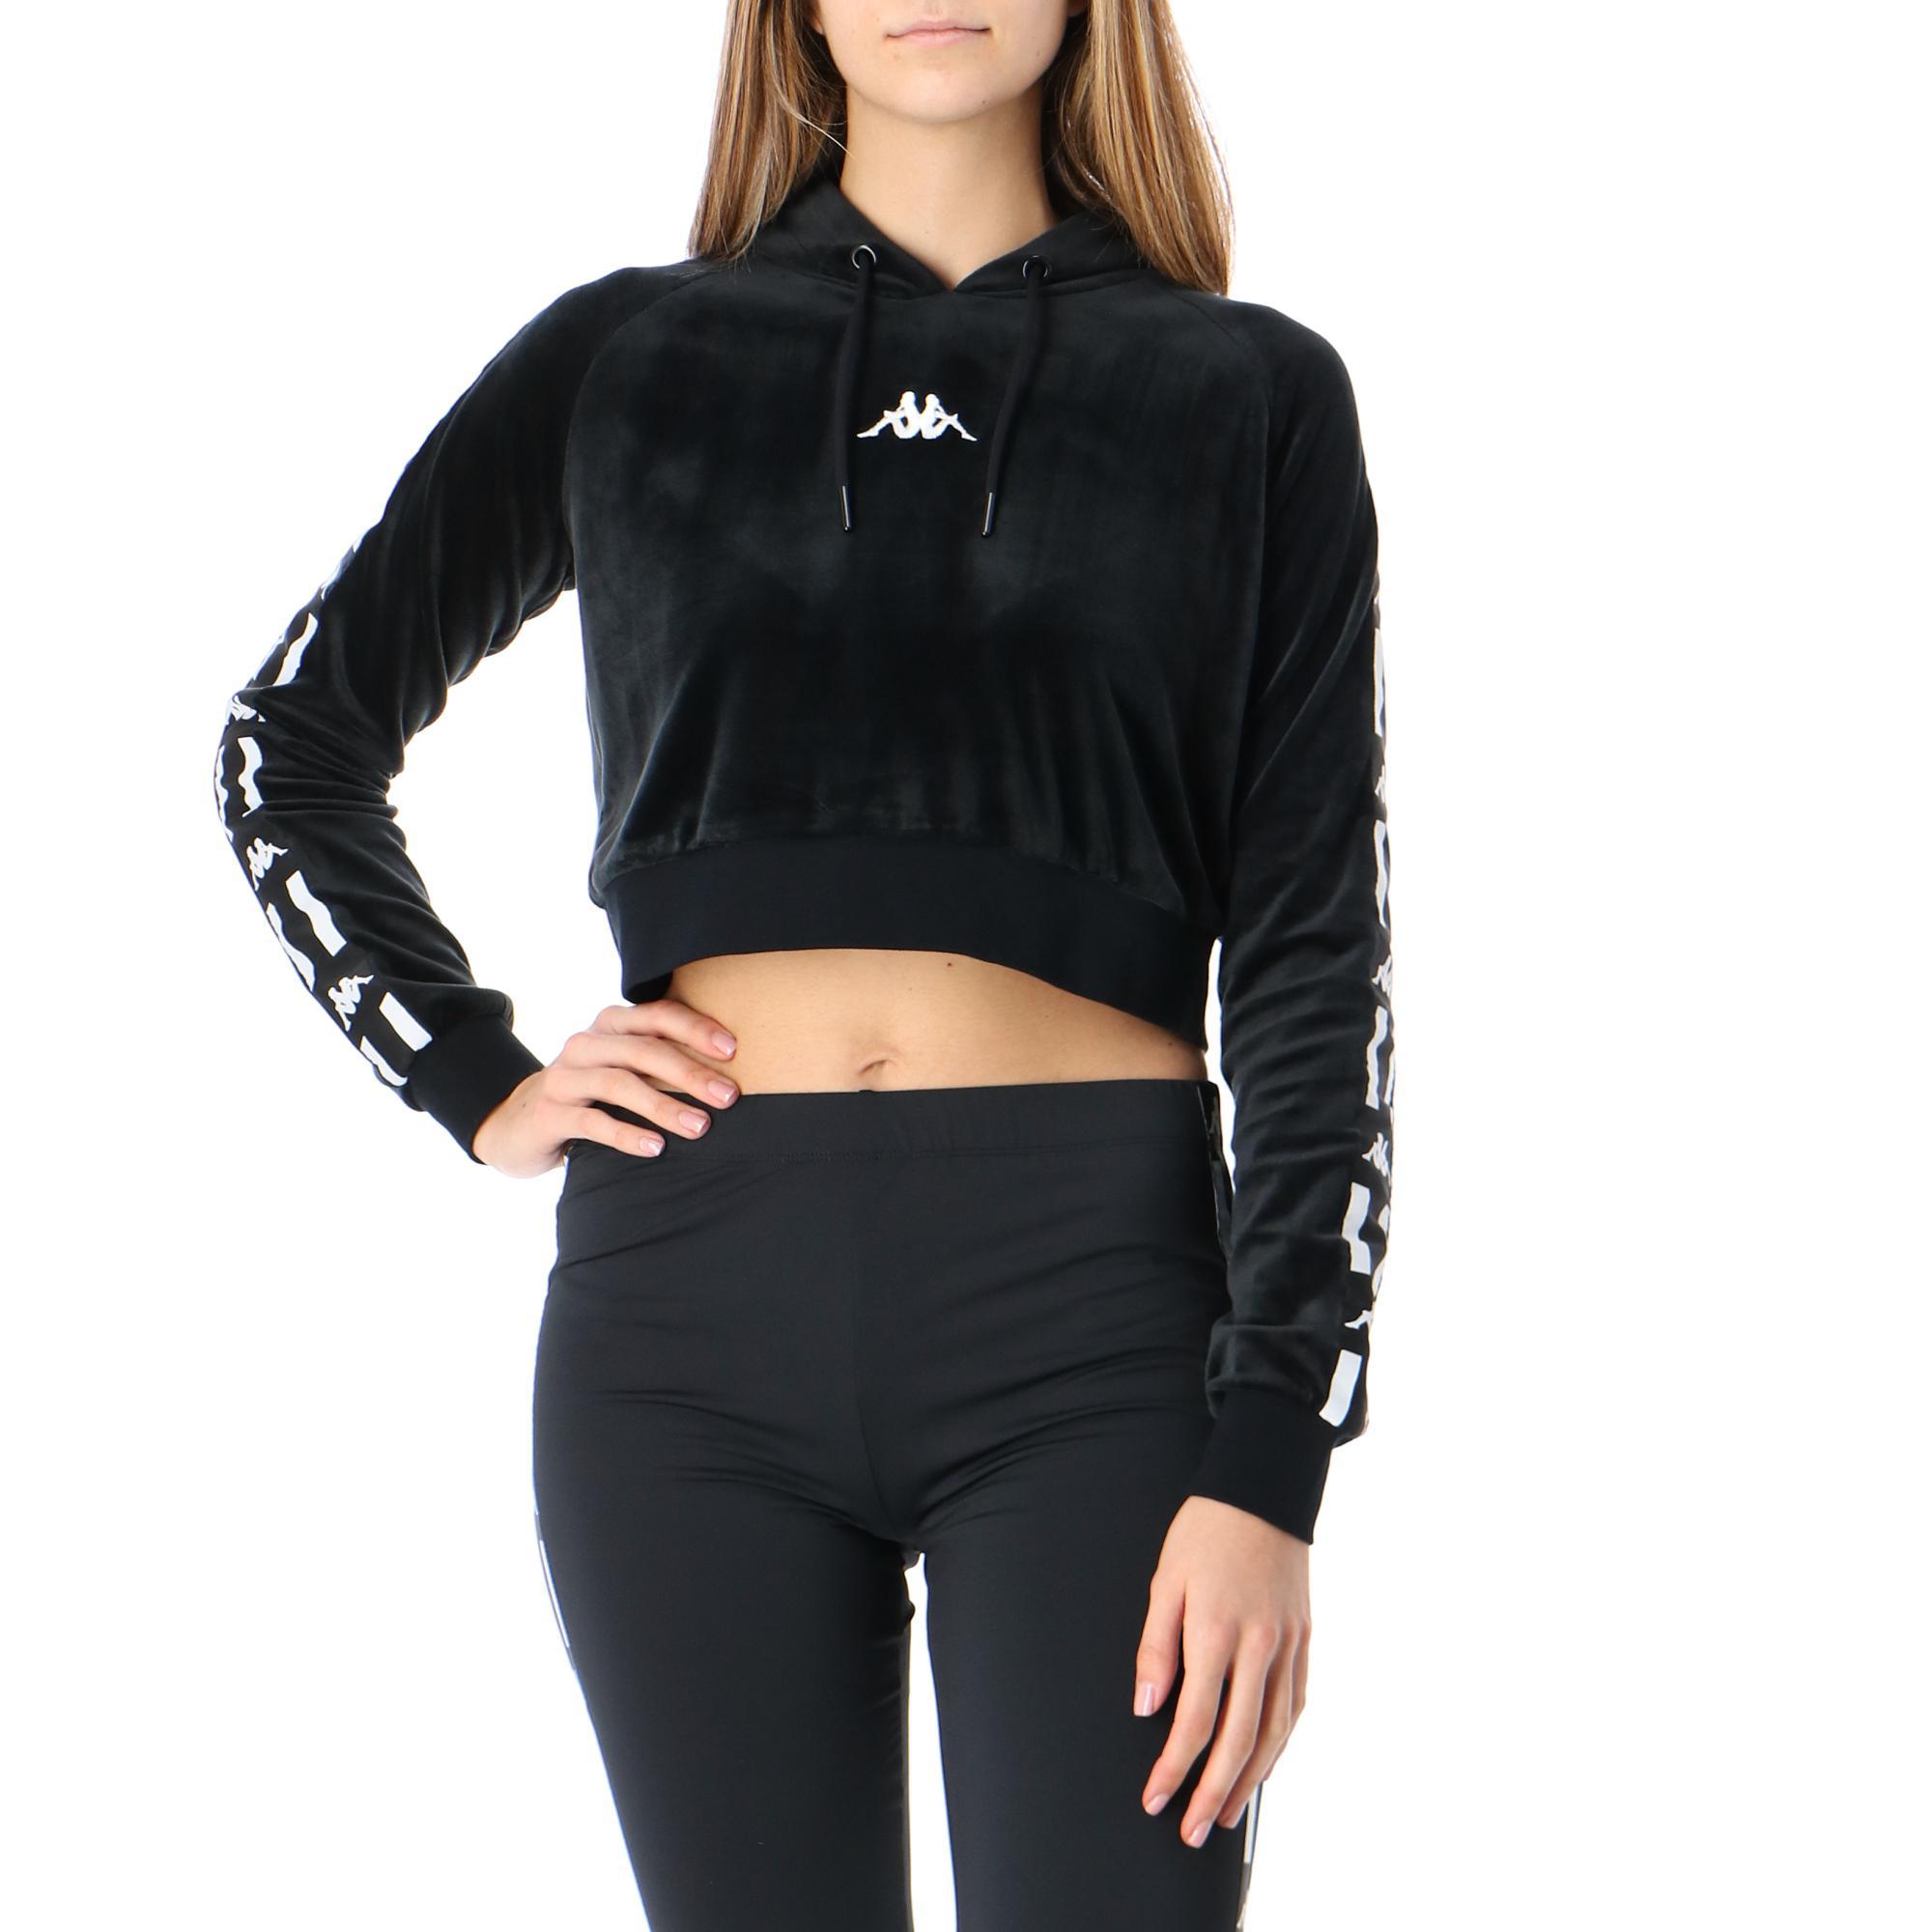 Kappa Authentic La Damas Black white